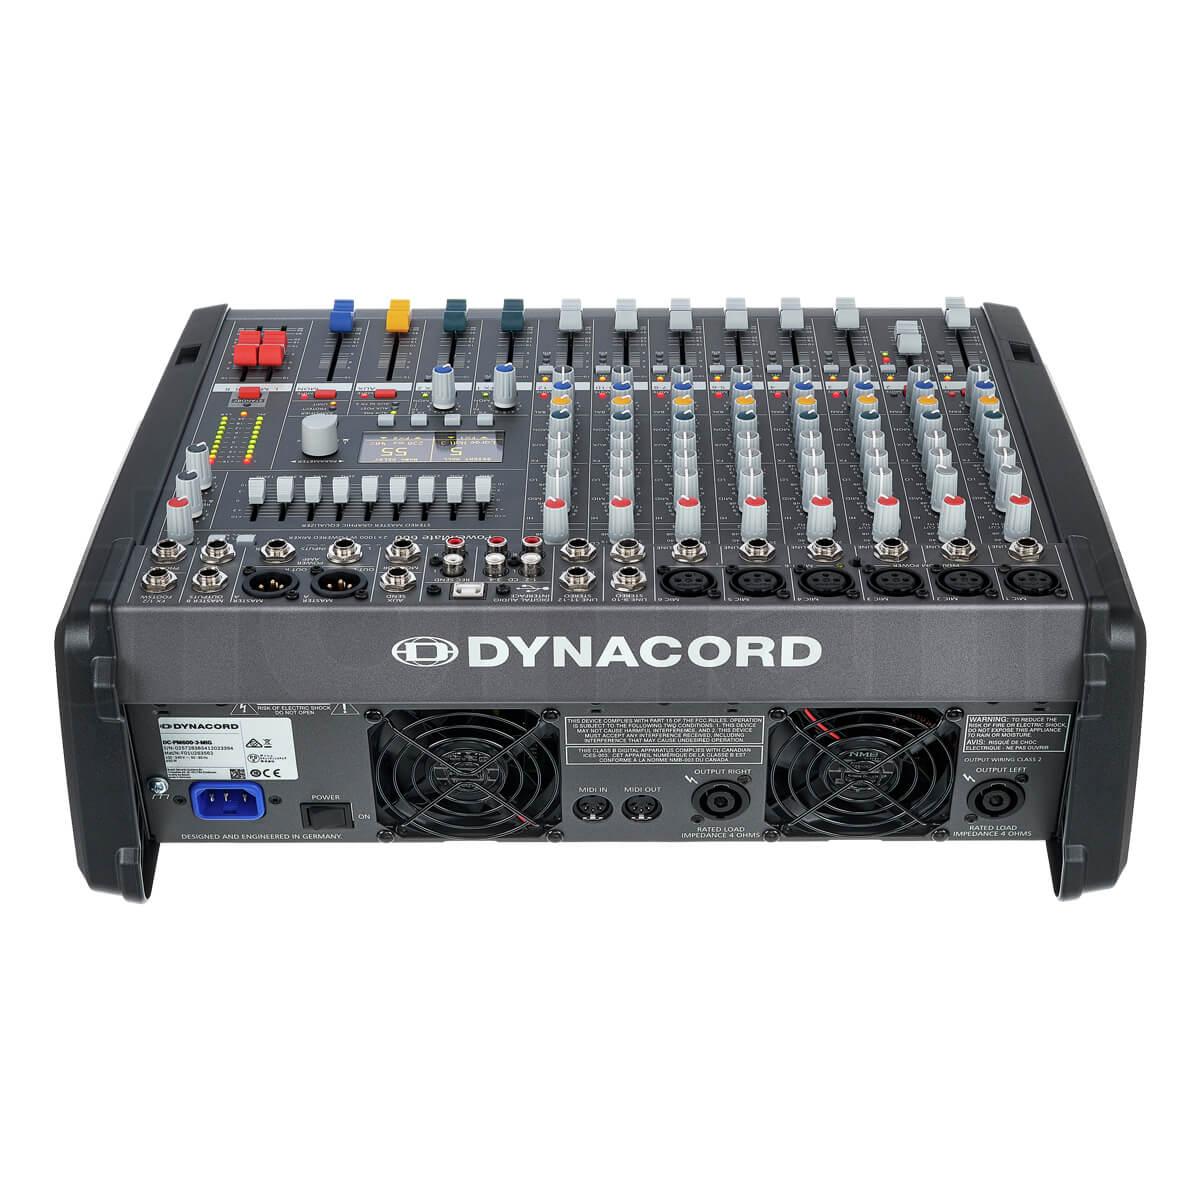 Mixer Dynacord Powermate 600-3 nhap khau